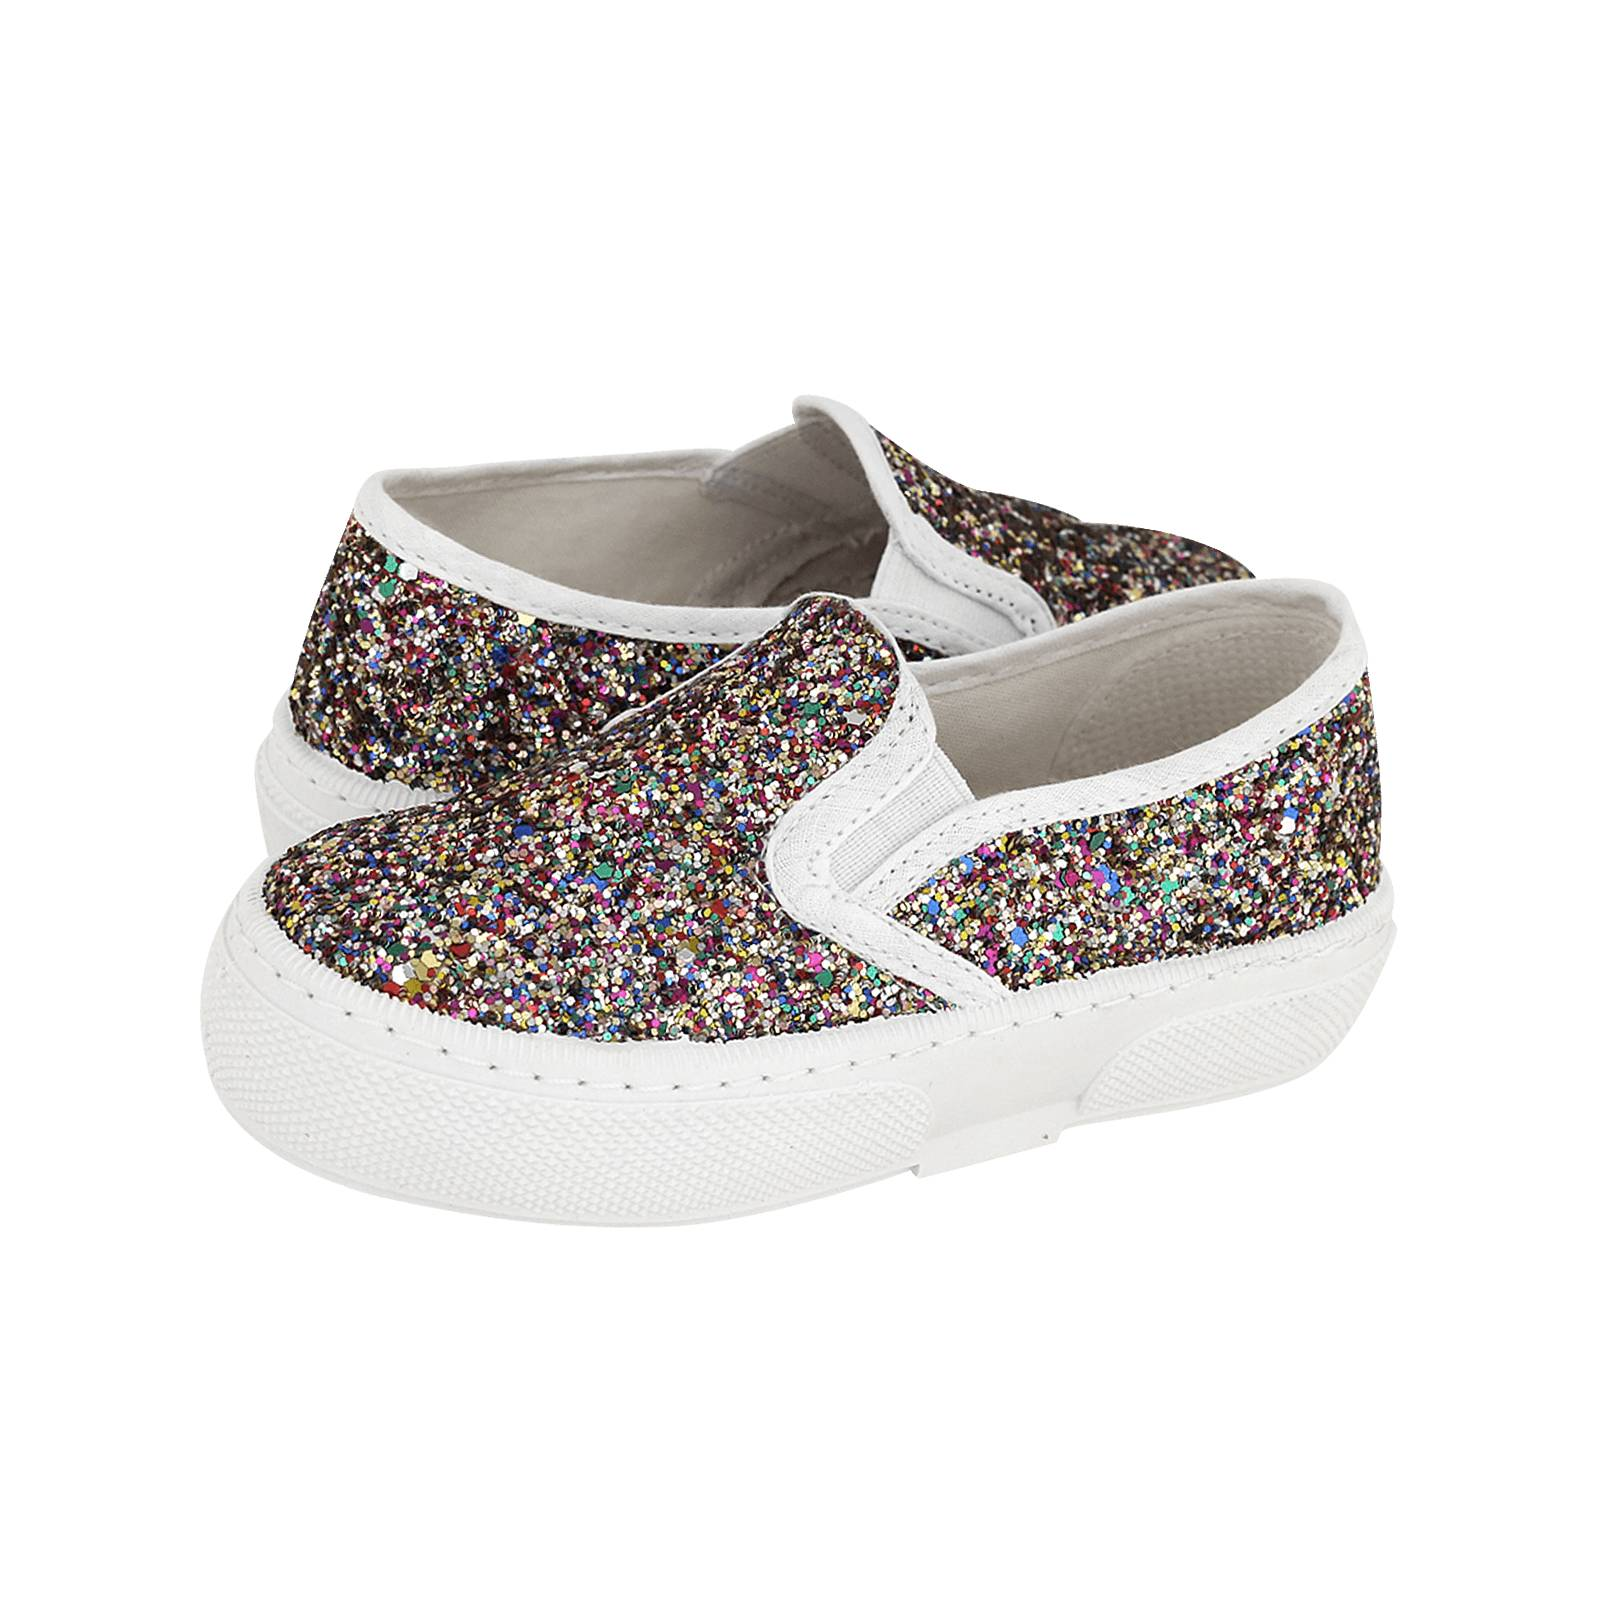 dd12b9e5a95 Cesme - Παιδικά παπούτσια casual Michelle από glitter και υφασμα ...